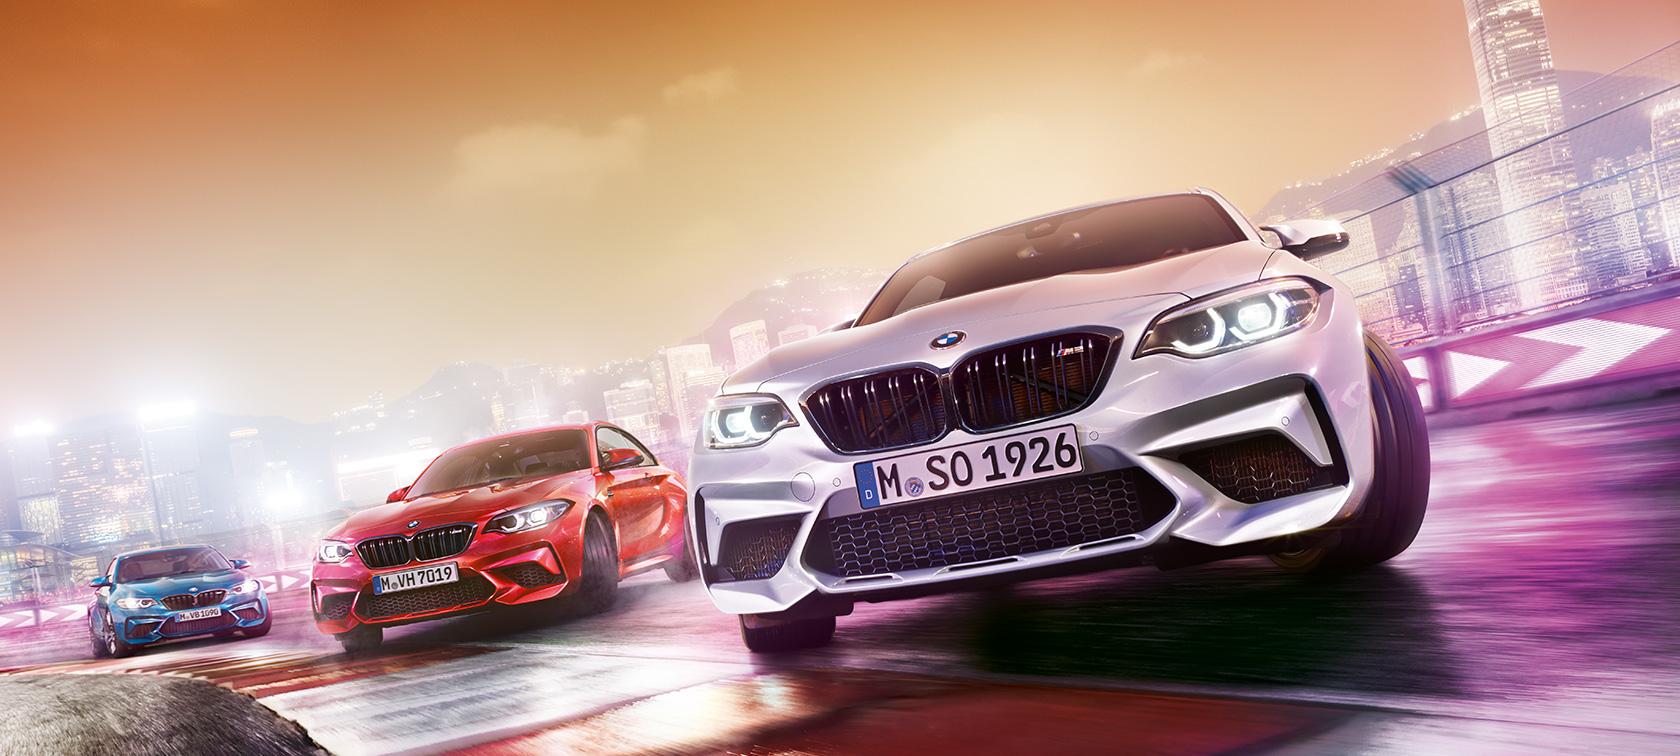 Bmw M Series >> Yeni Bmw M2 Competition Bir Spor Otomobilden Daha Fazlasi Bmw Turkiye